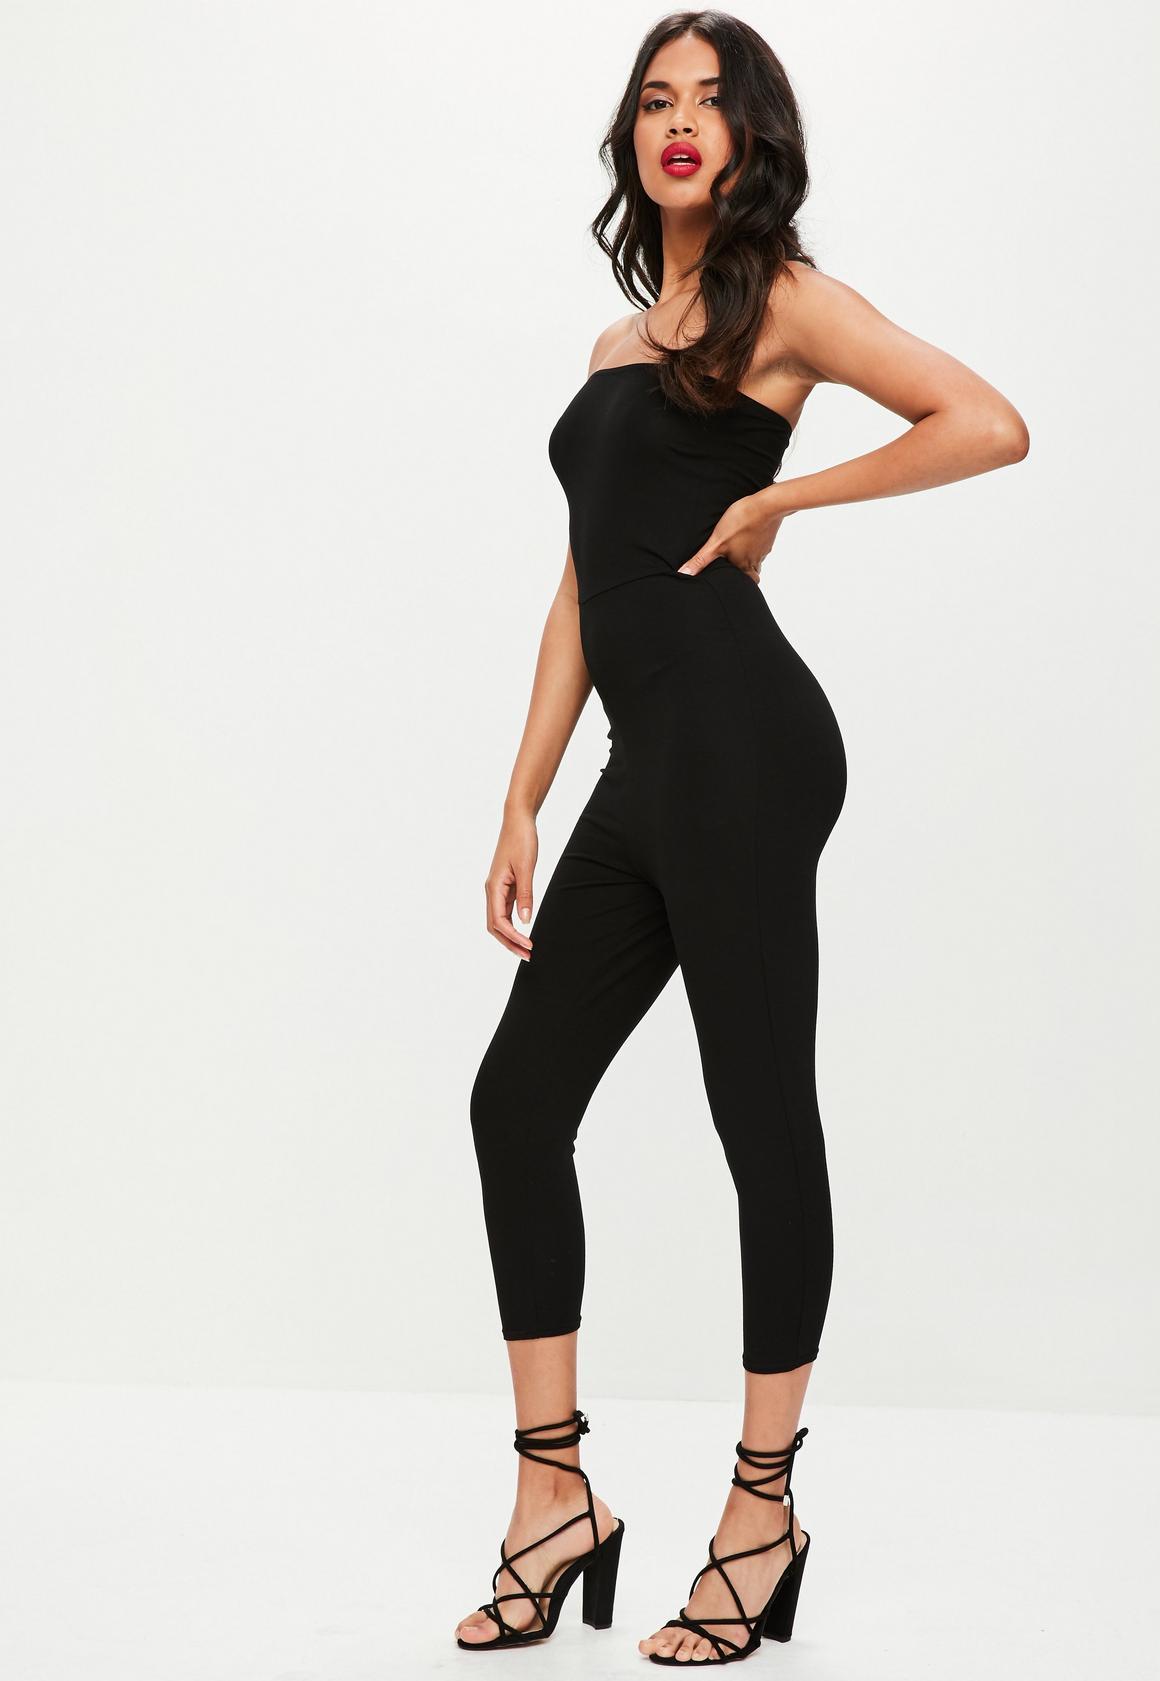 bb3ef3fec961 Latest Fashion Trend of Clothes 2018